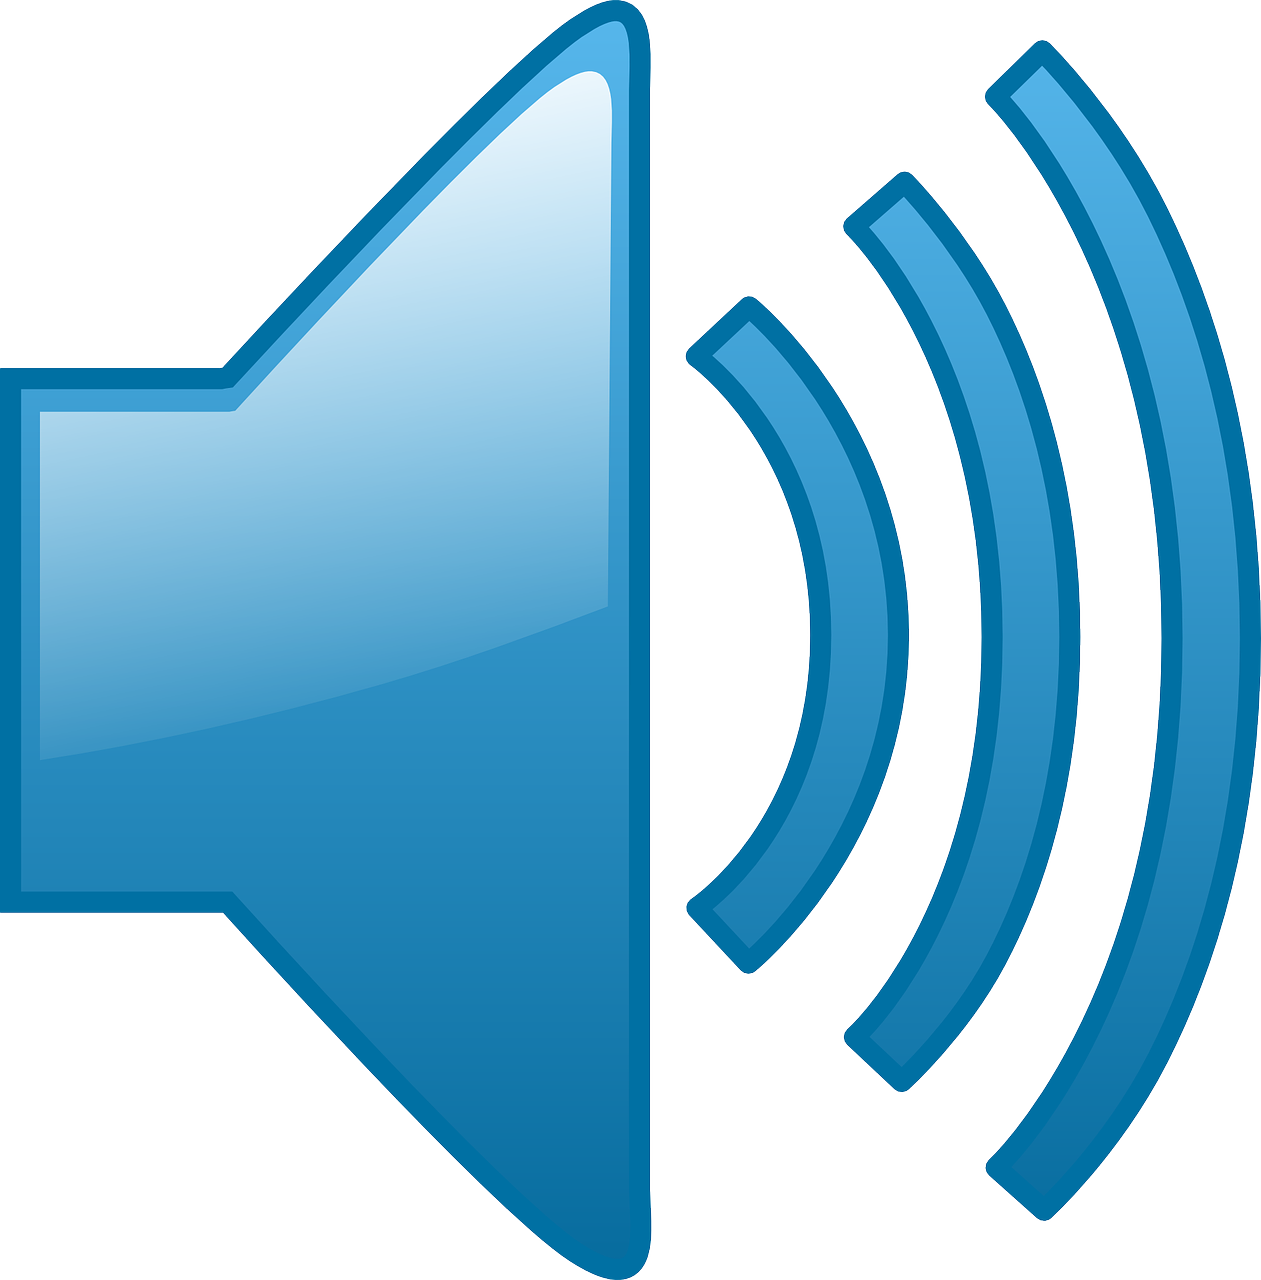 Clock clipart sound. Best wireless doorbells reviews